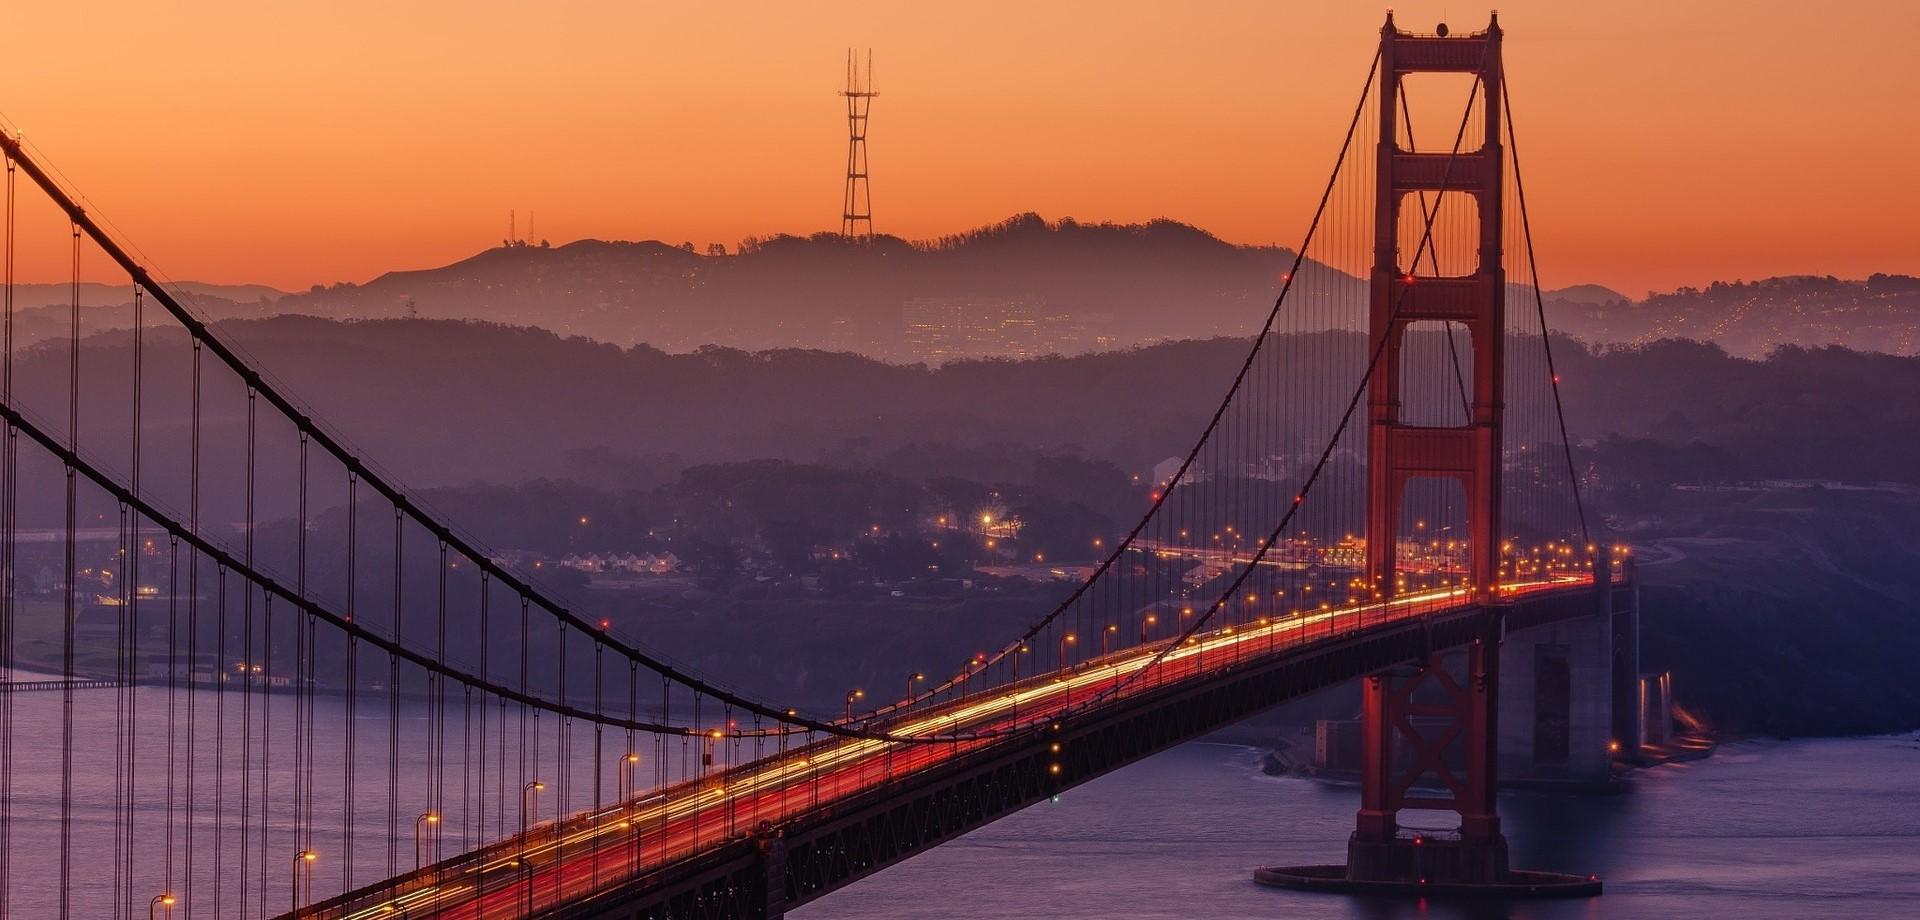 The Golden Gate Bridge in San Francisco, California | Kids Car Donations